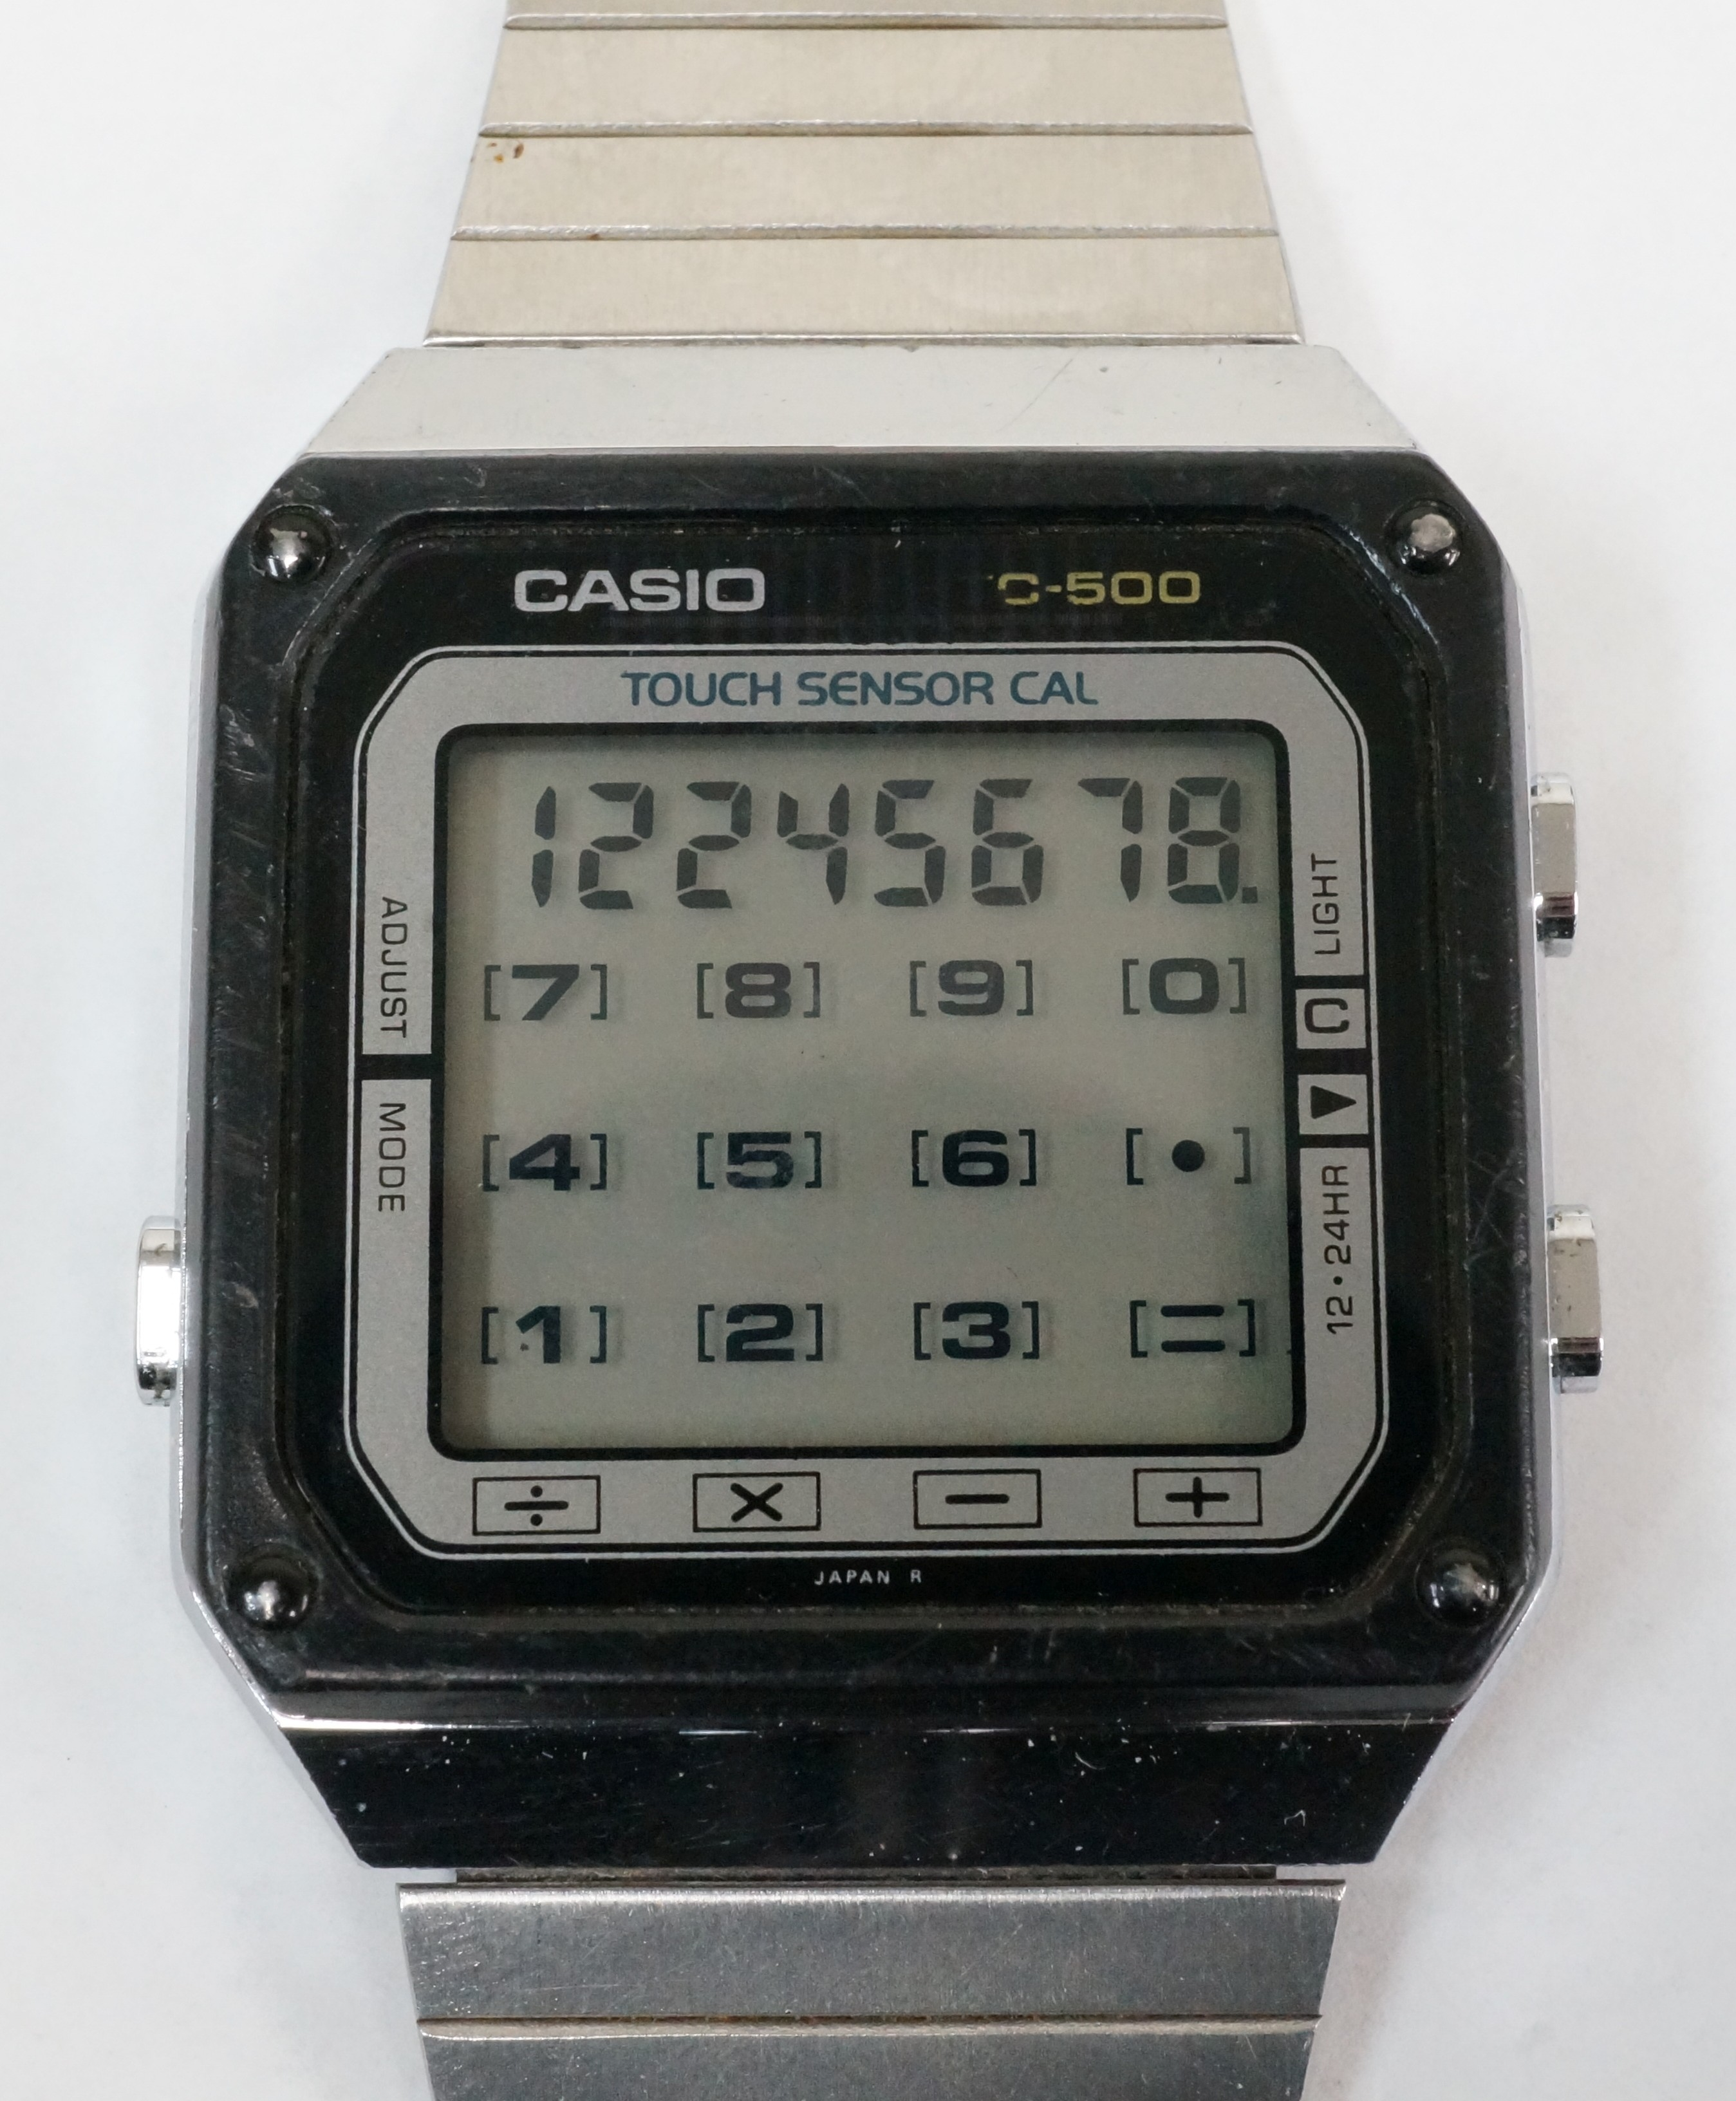 8ade19ef65 Calculator watch - Wikiwand